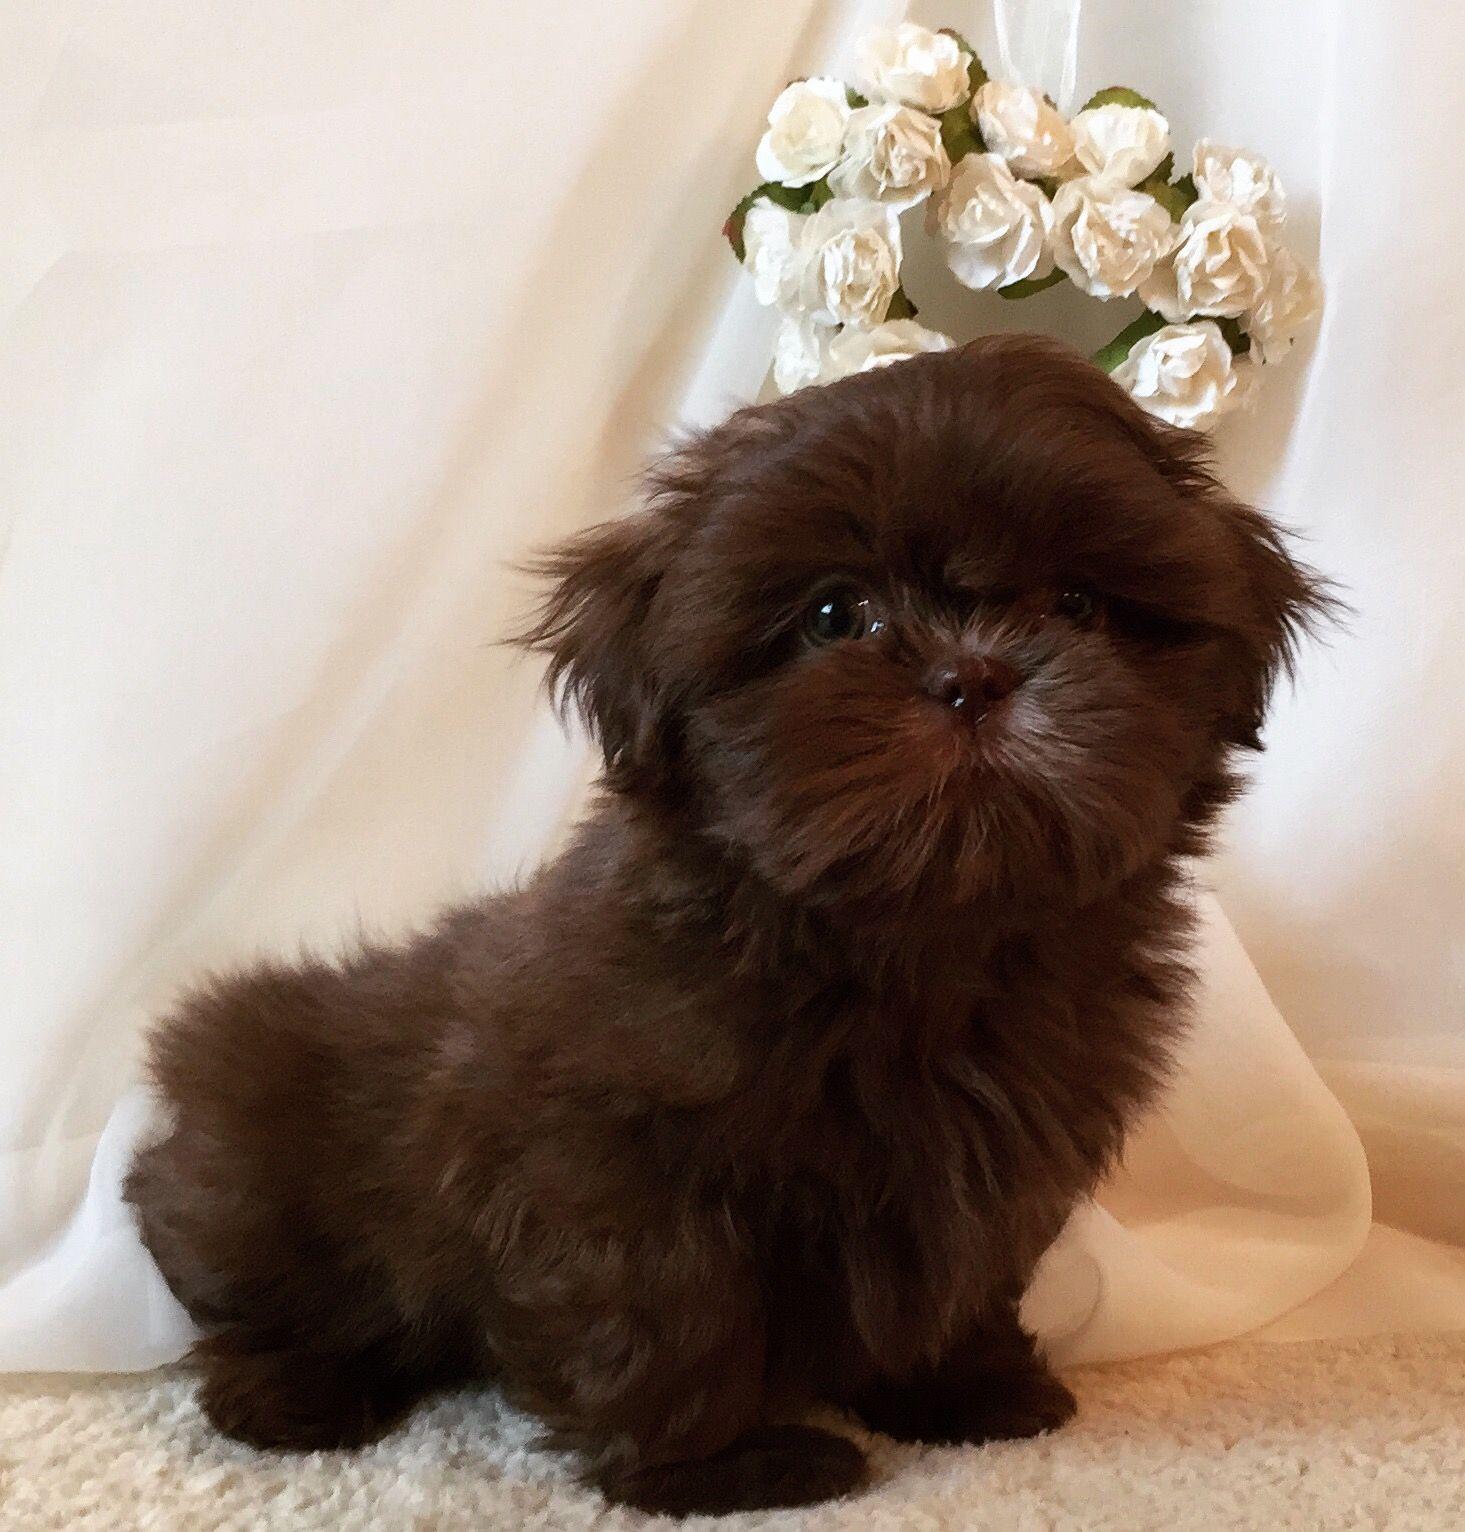 Shih Tzu Affectionate And Playful Shih Tzu Dog Puppies